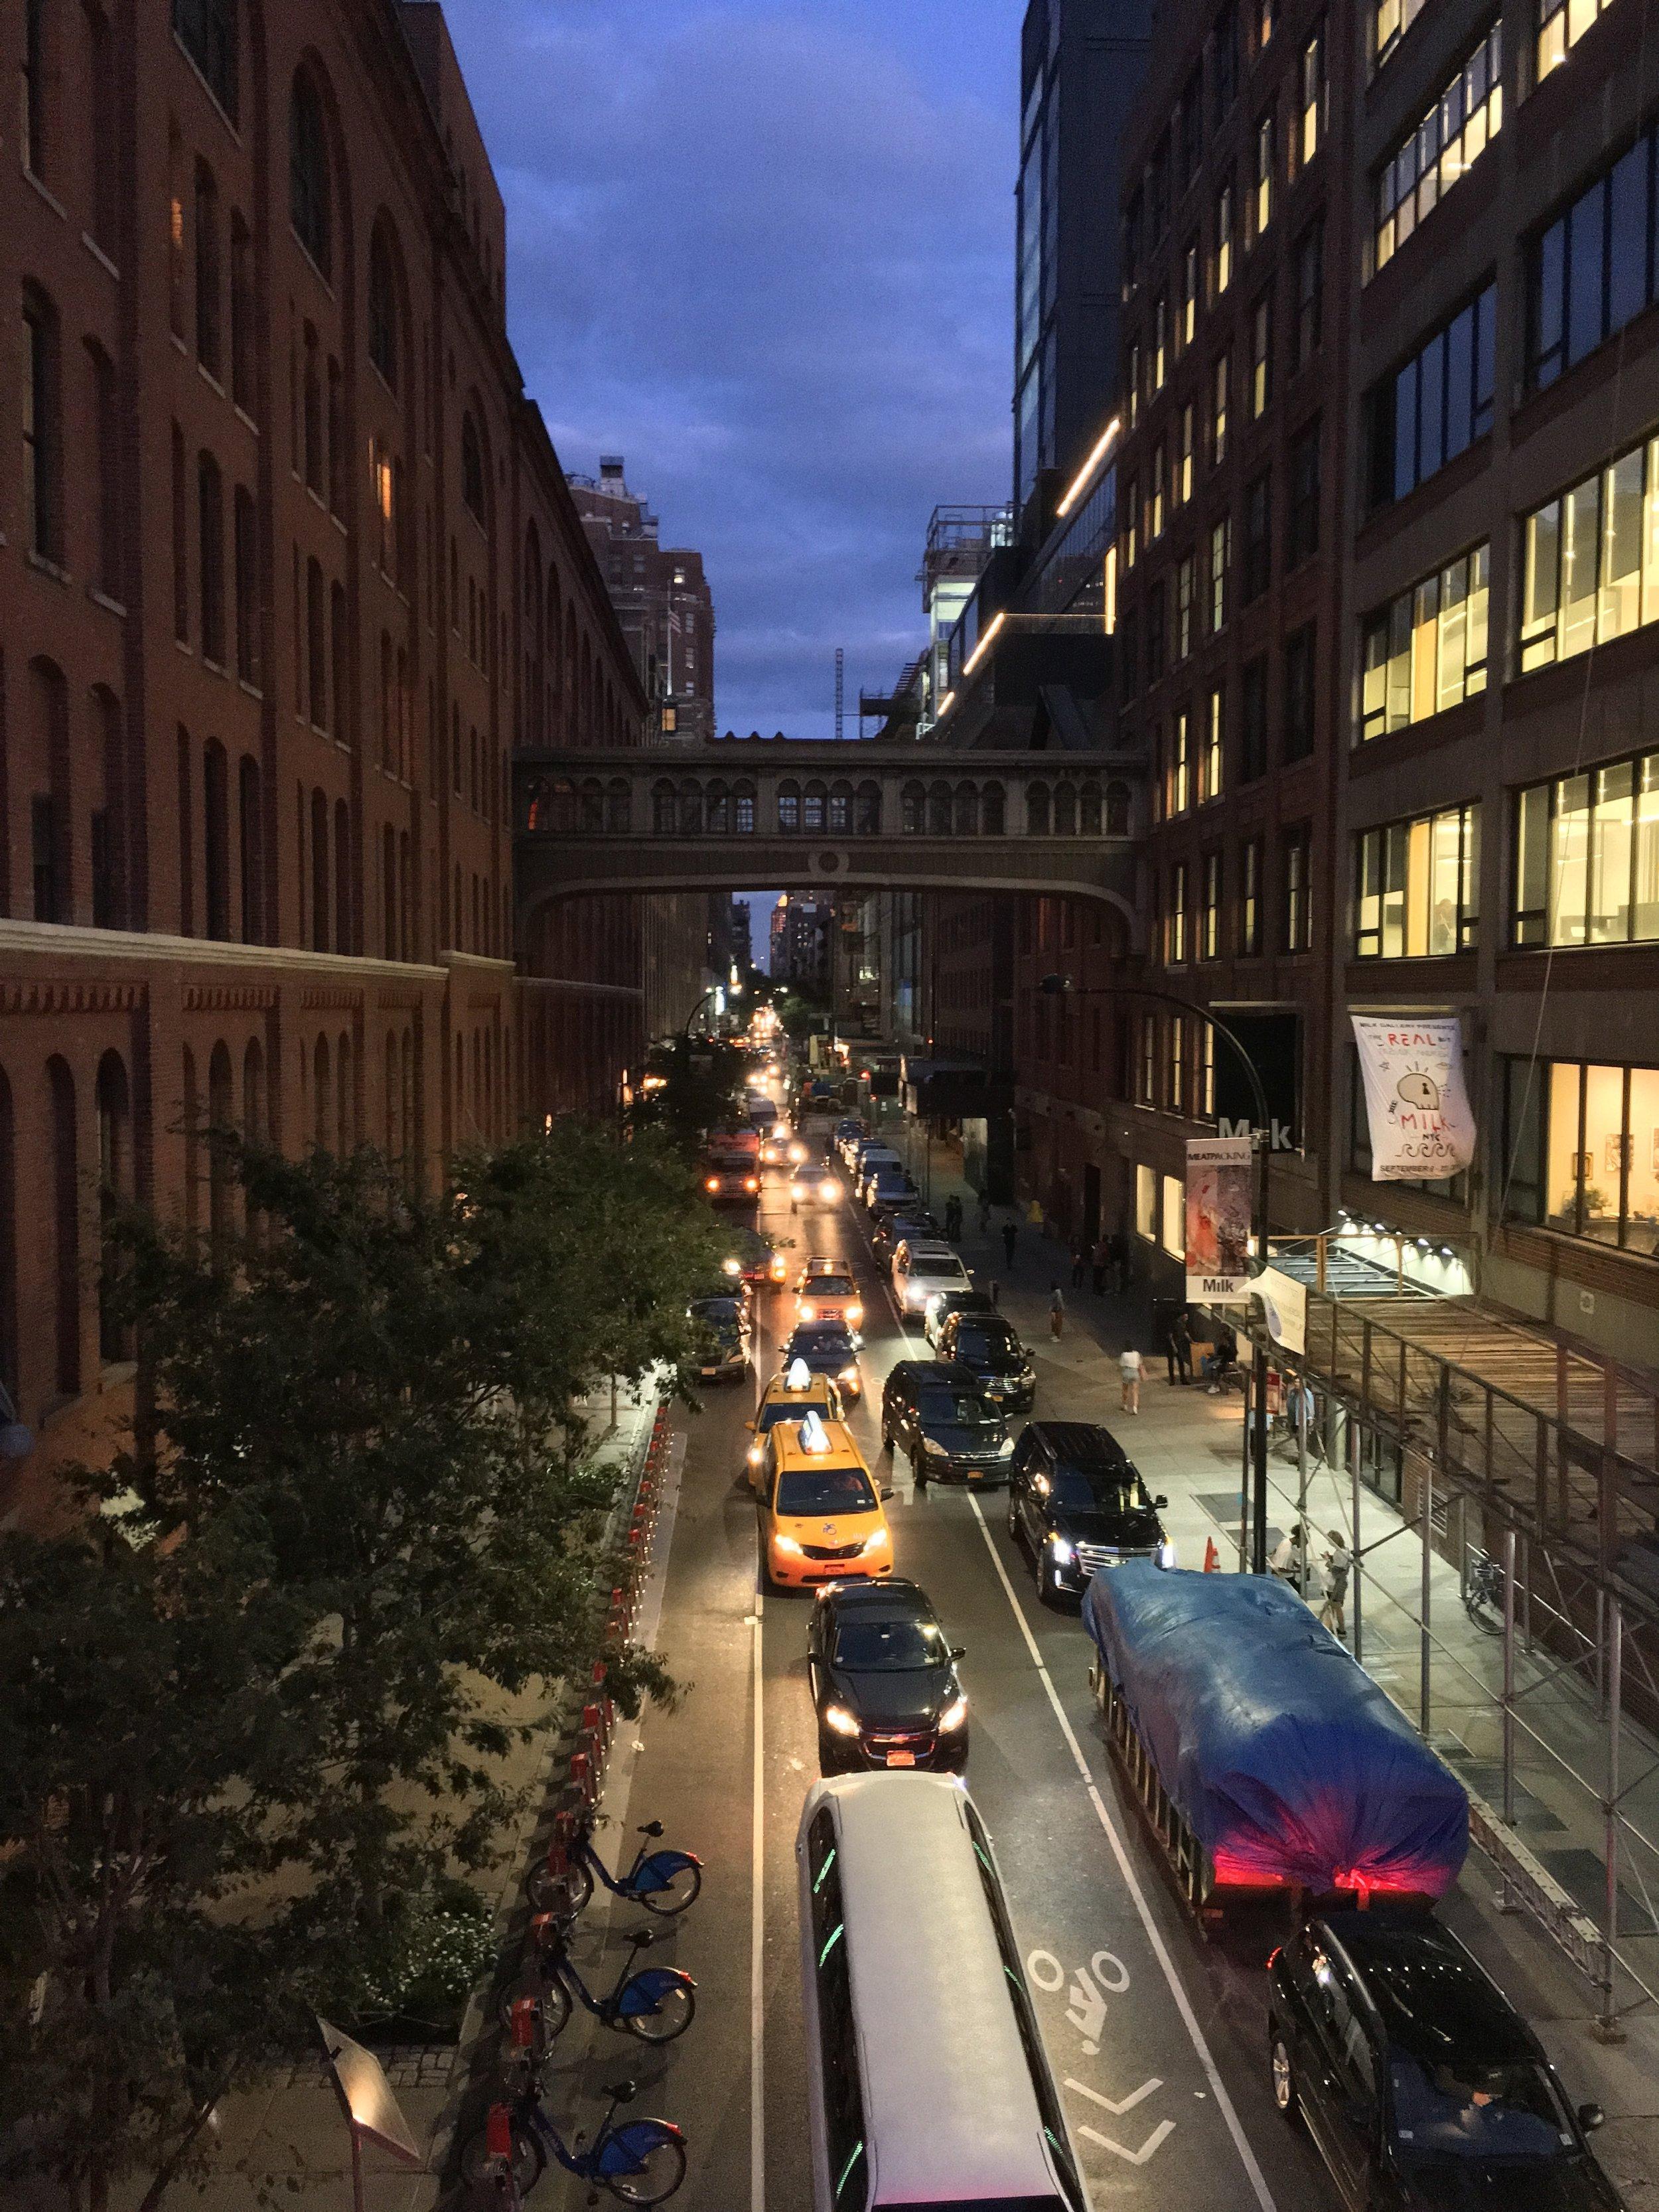 Nighttime on the Highline. Photography: Allison Jane (@Thestoryofajane)